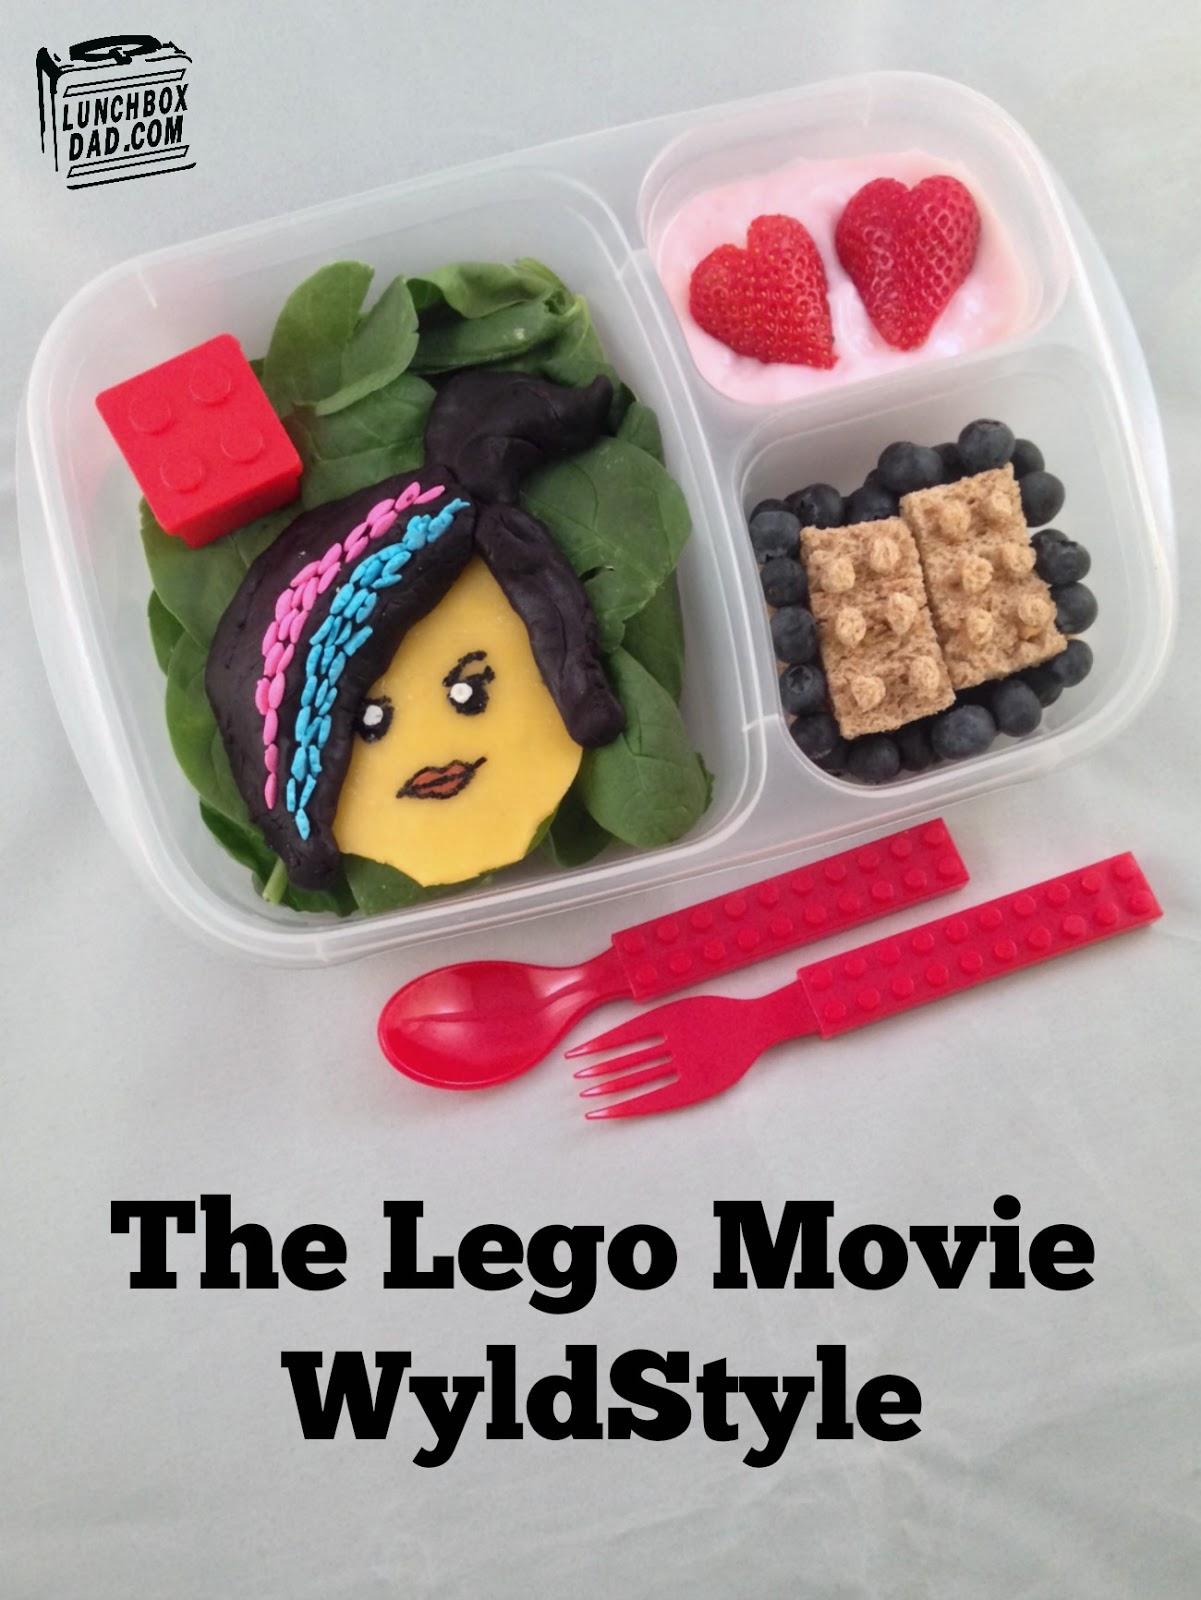 Lego-themed school lunch idea for kids